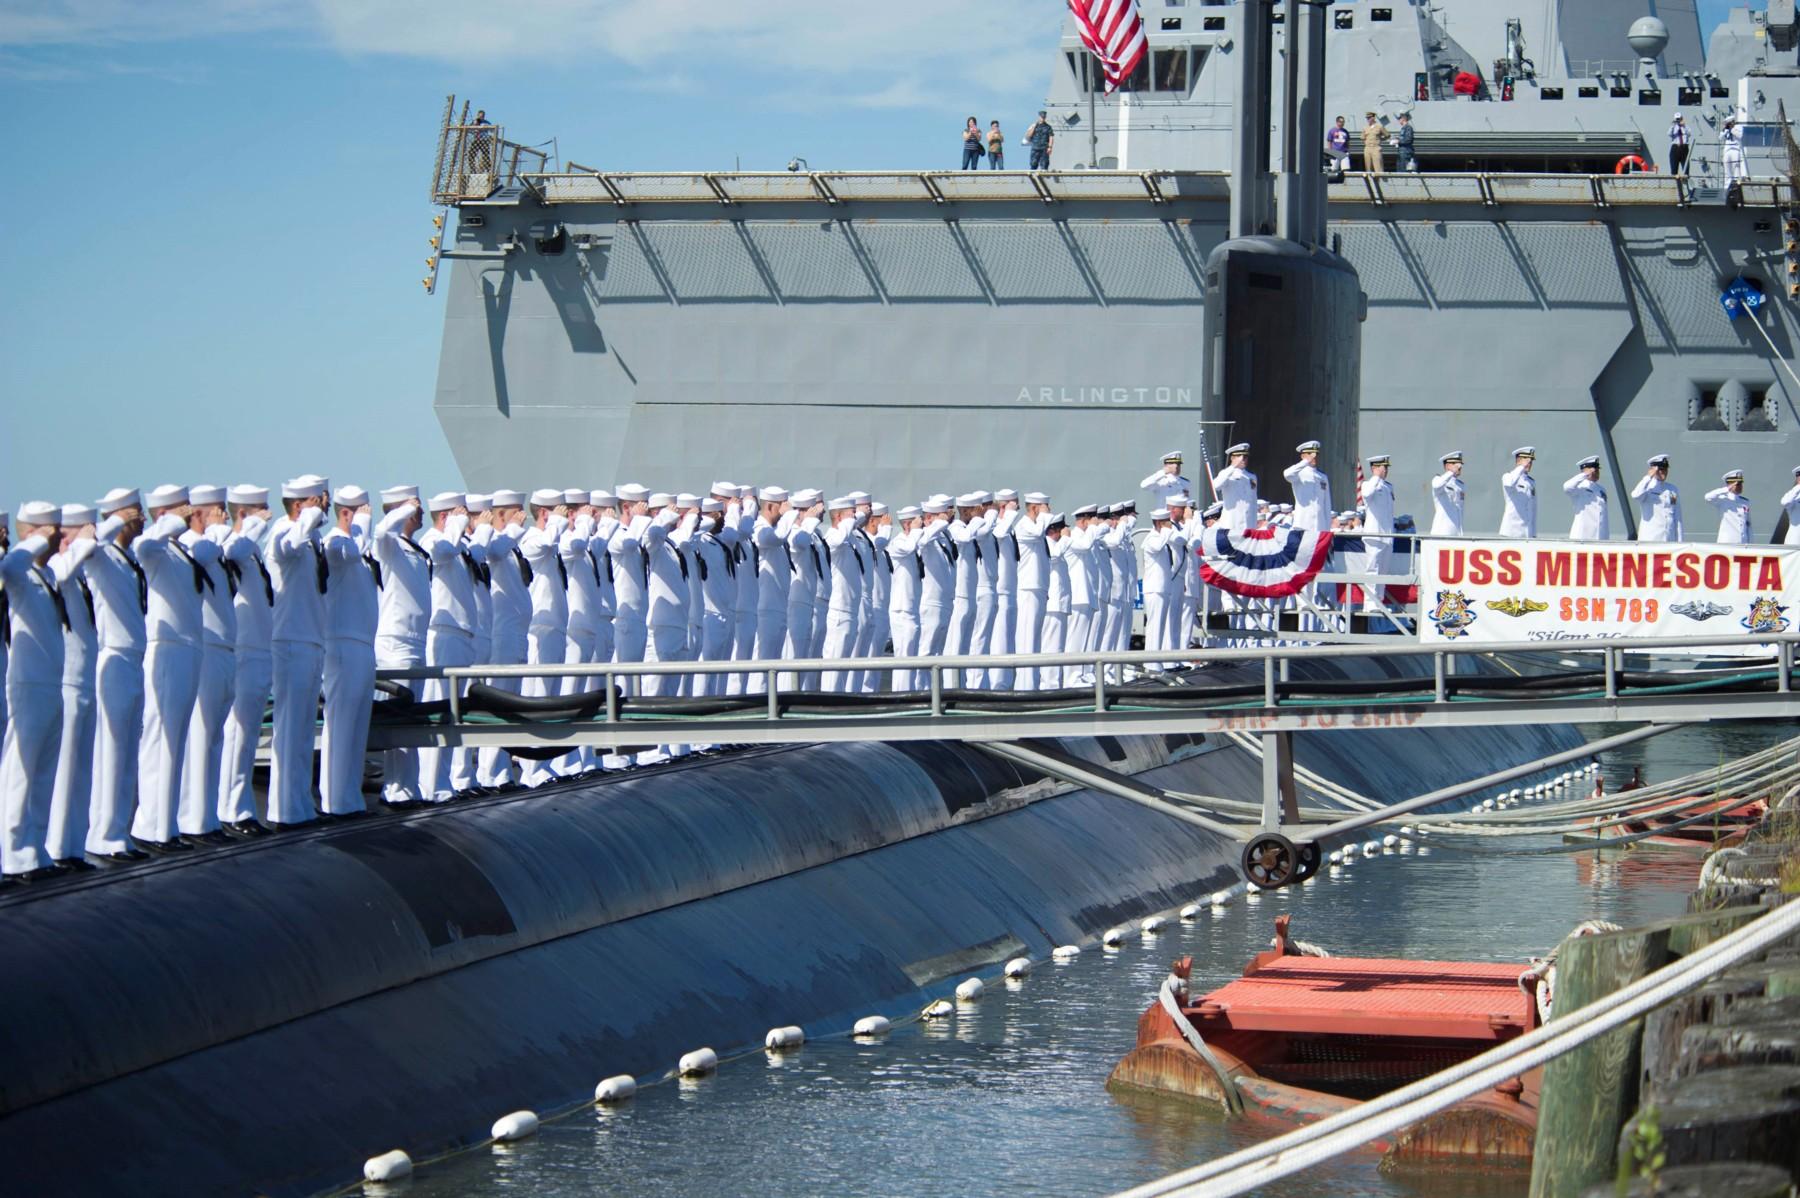 SSN-783 USS Minnesota Patch